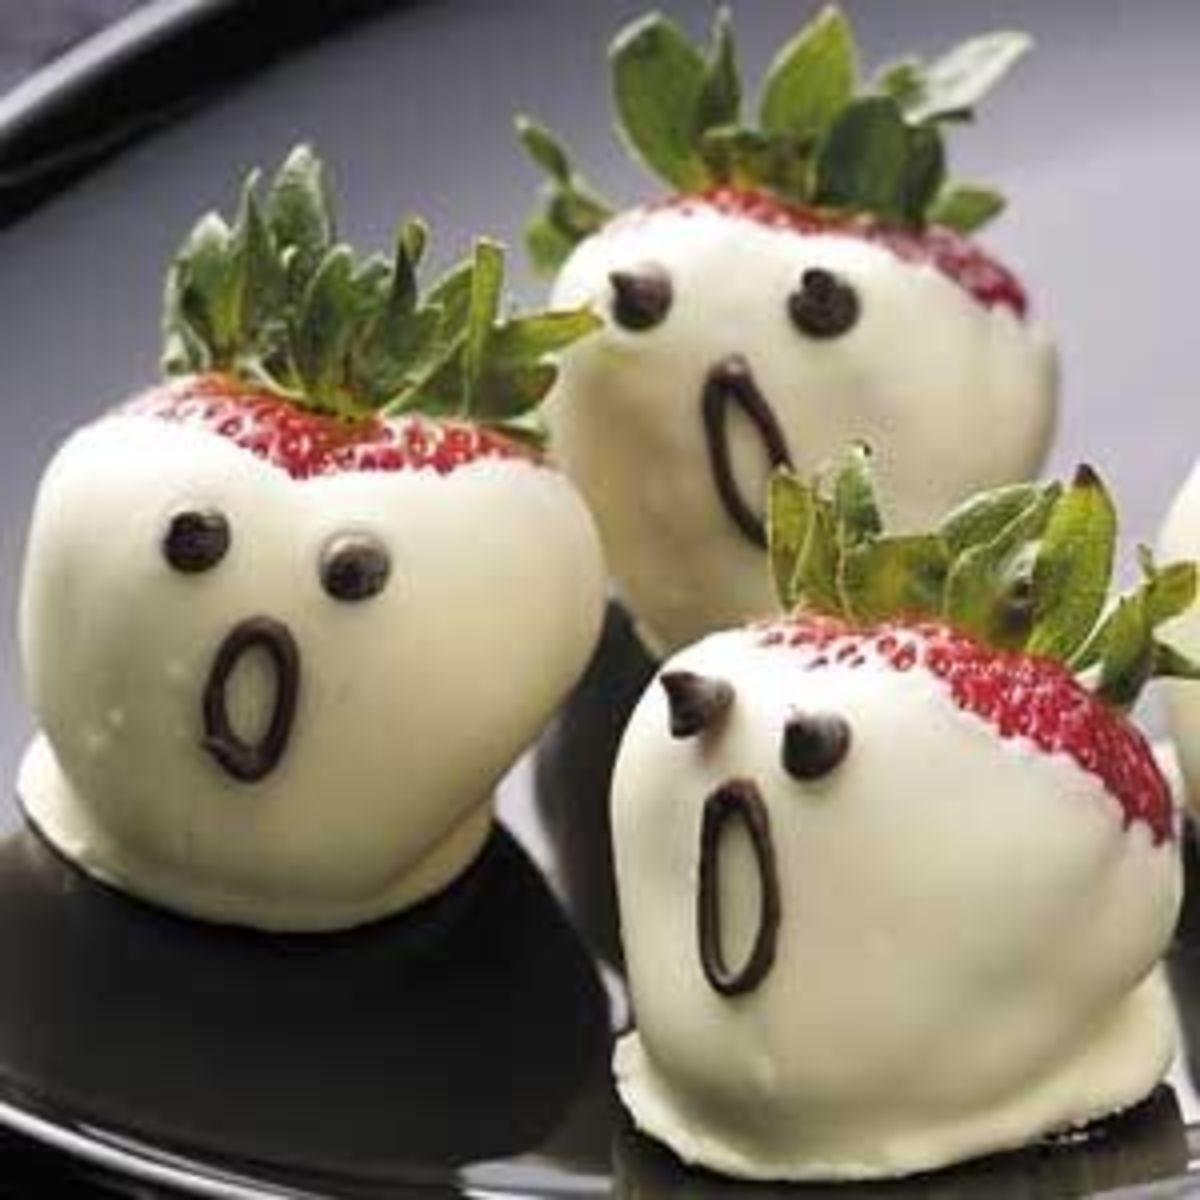 Halloween Food Ideas - Strawberry Ghosts